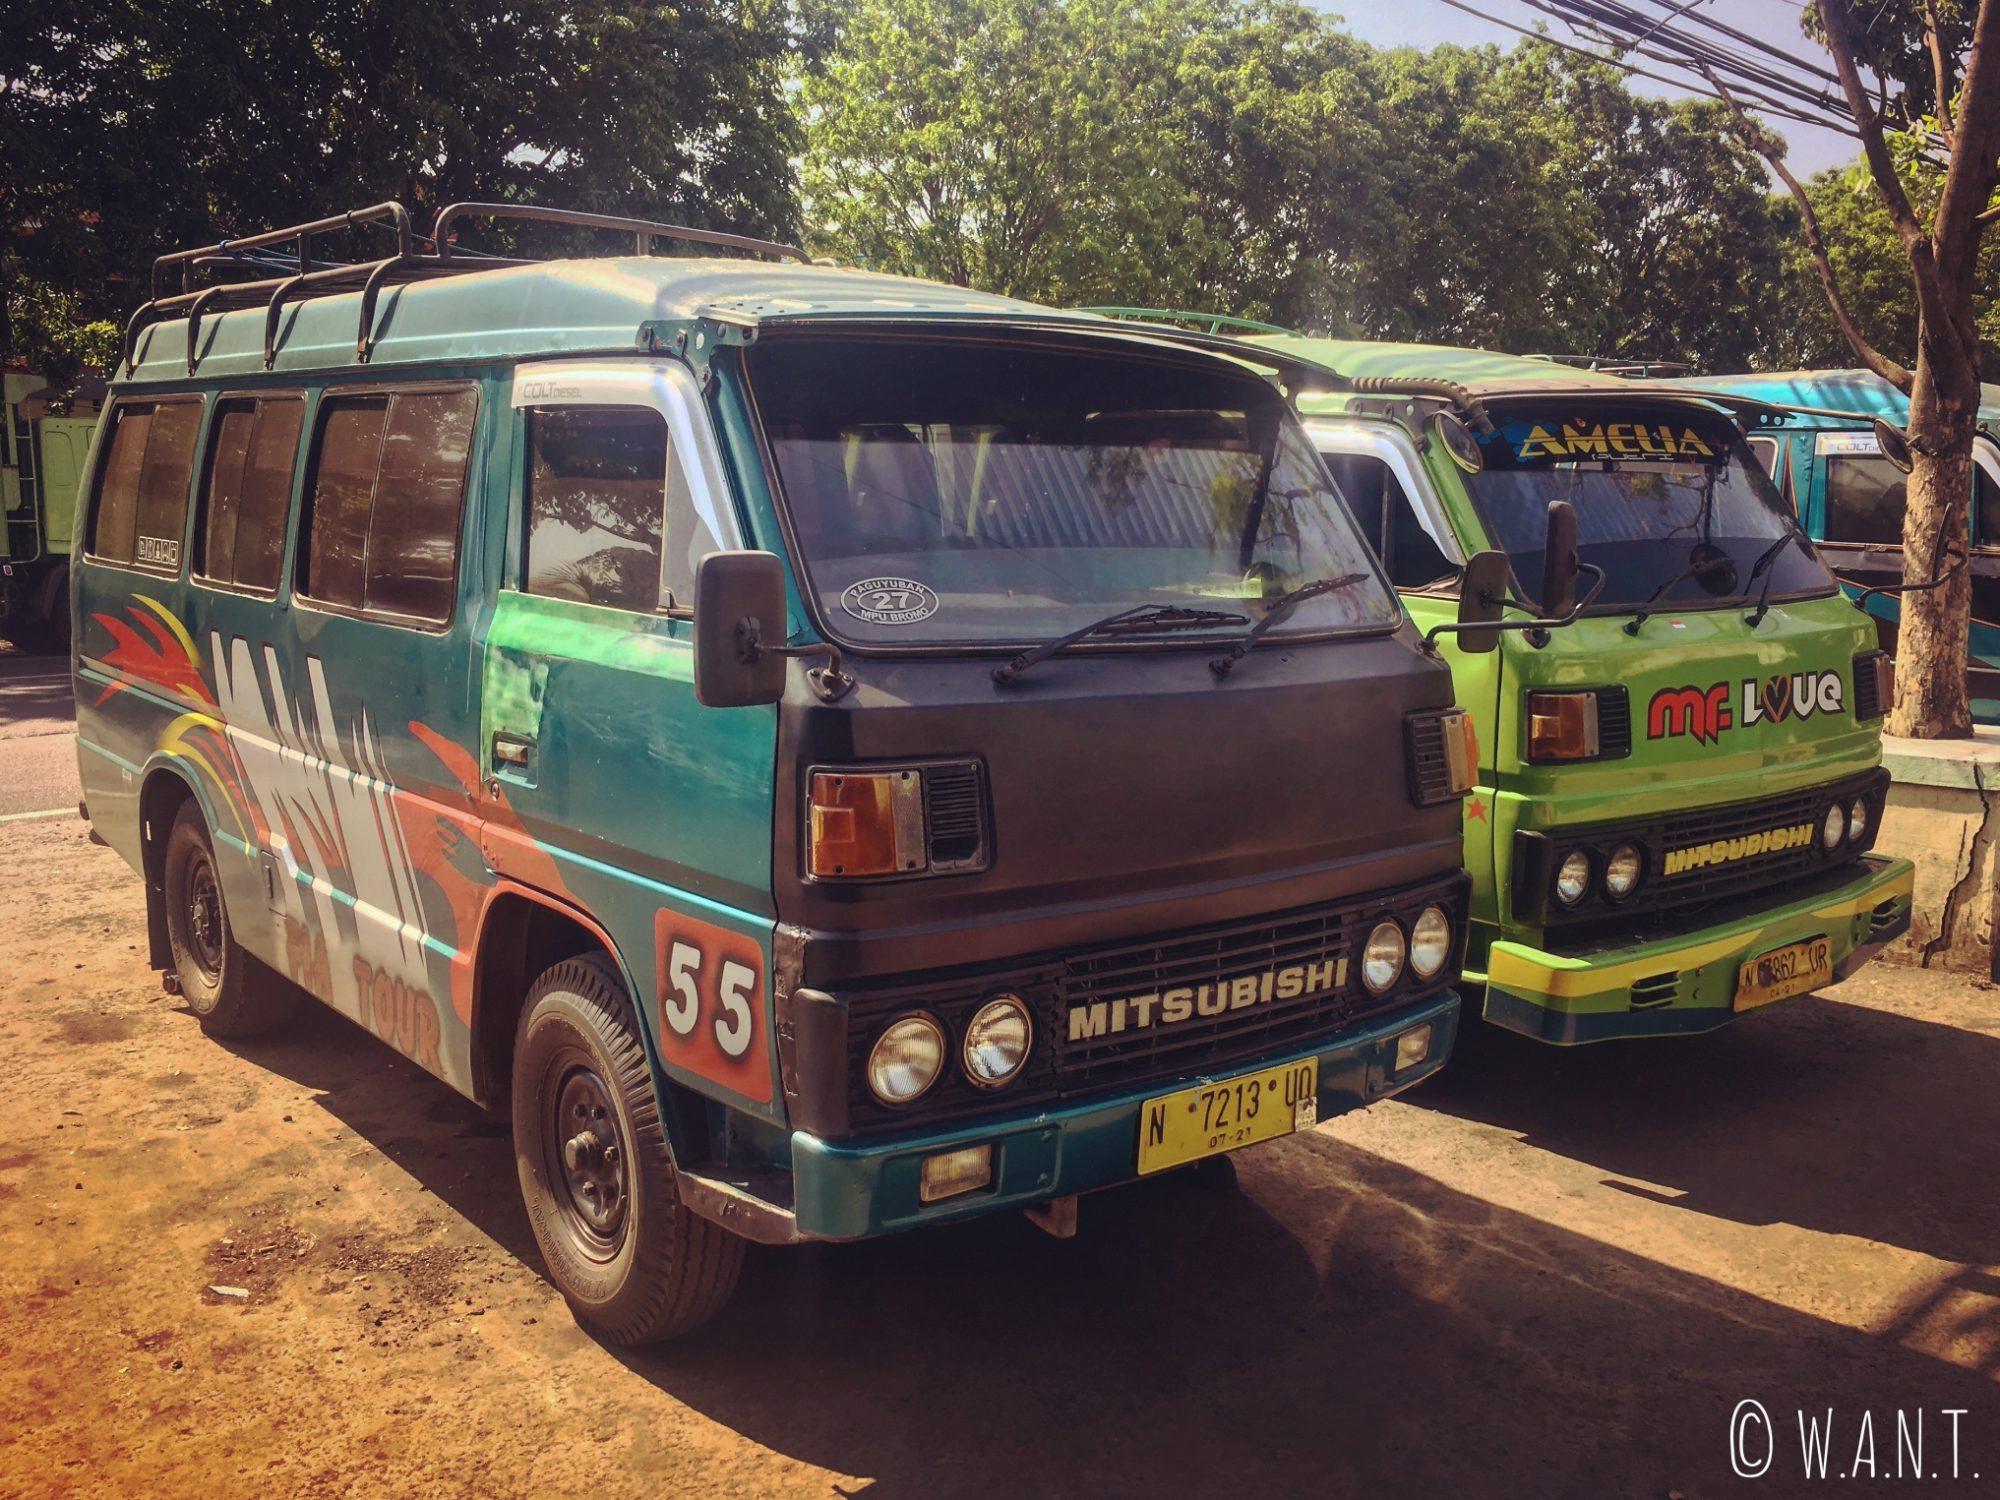 Minibus permettant de rejoindre Cemoro Lawang depuis Probolinggo